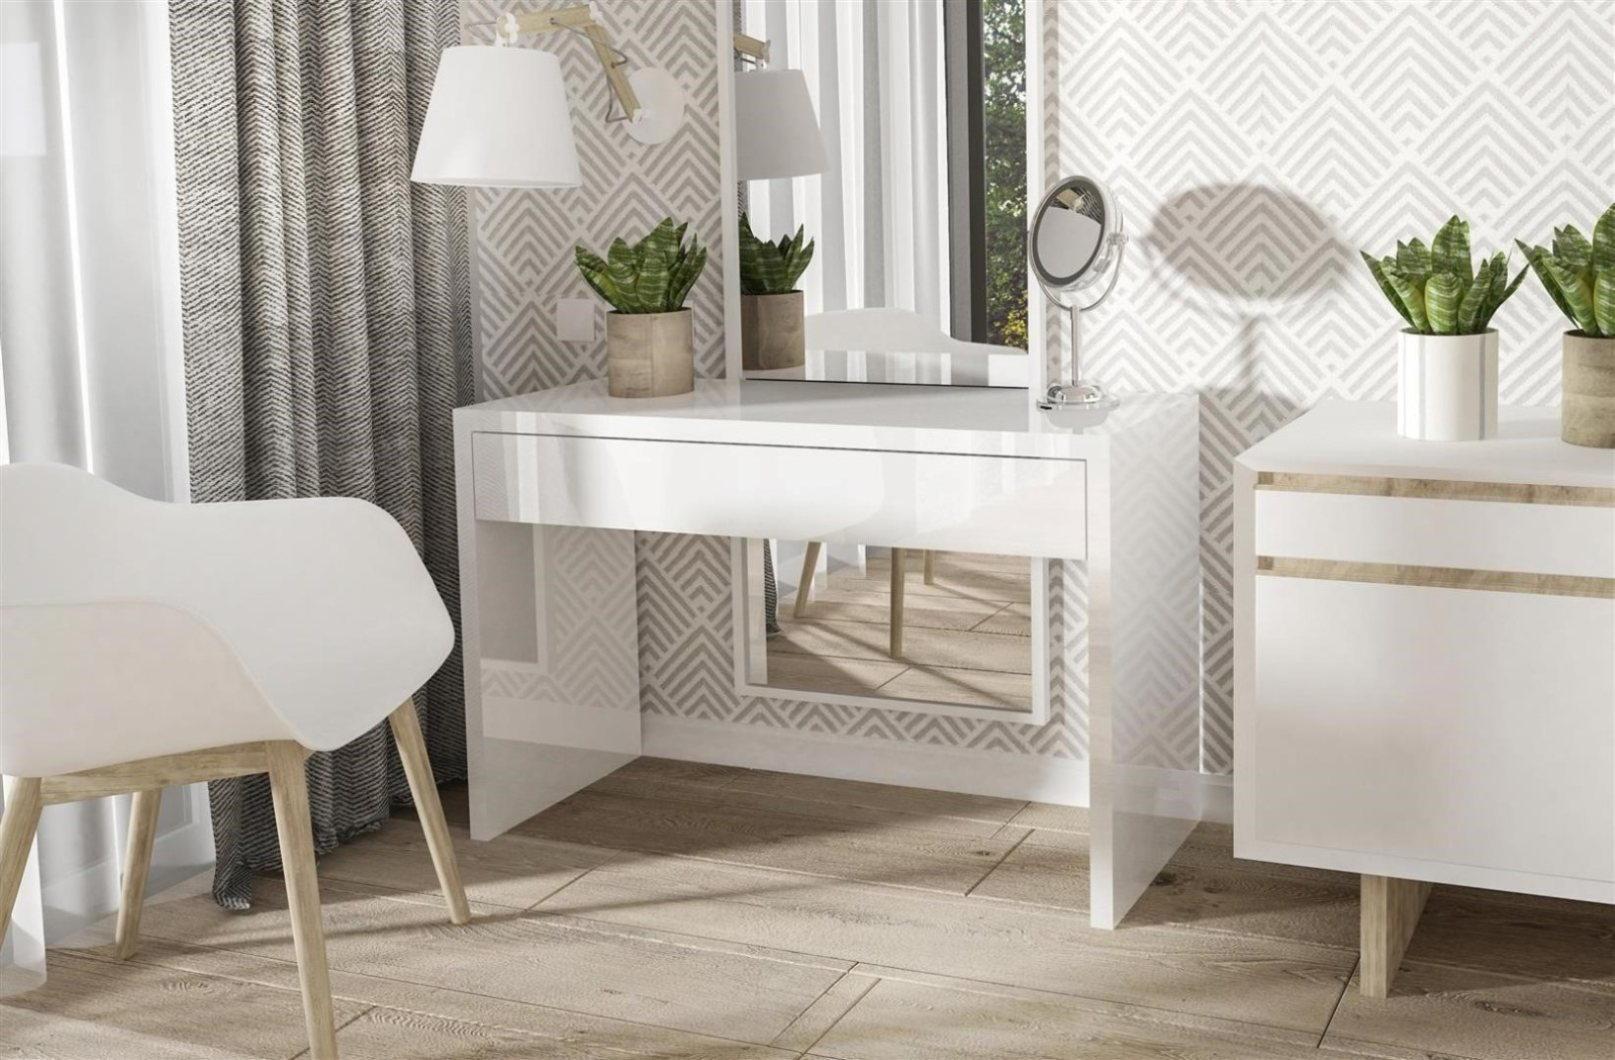 fragen und antworten endo moebel. Black Bedroom Furniture Sets. Home Design Ideas